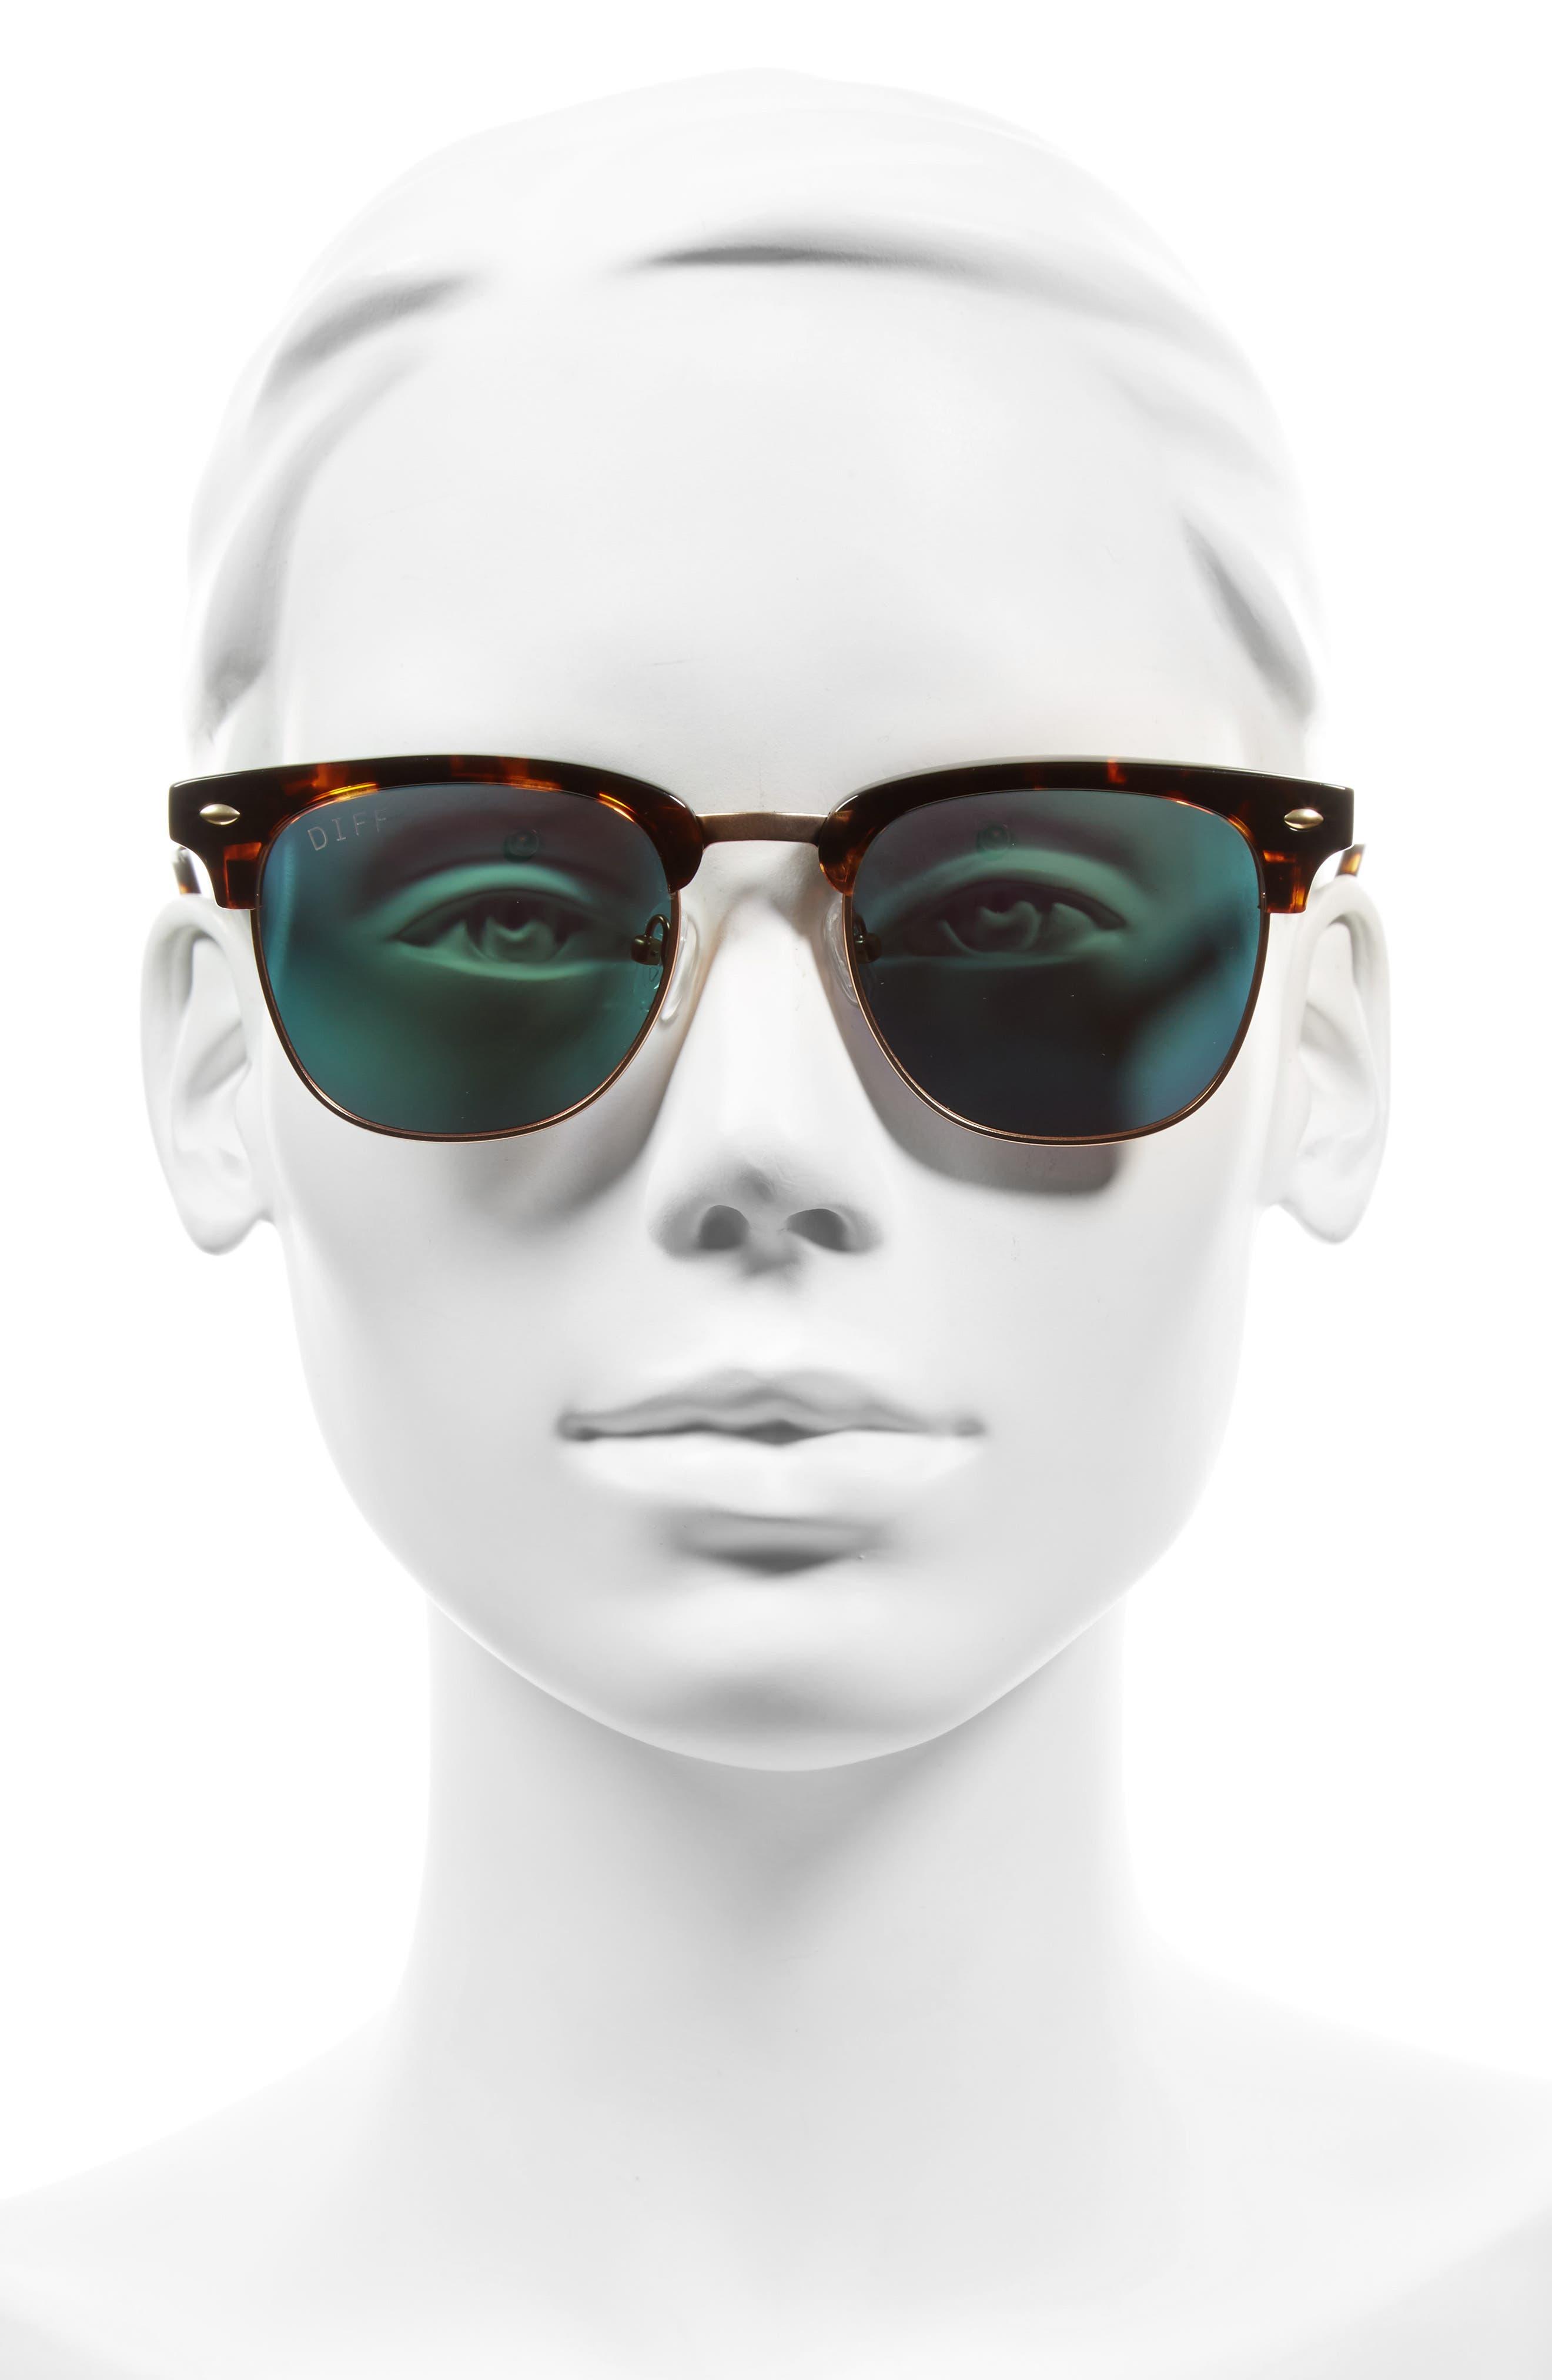 Barry 51mm Polarized Retro Sunglasses,                             Alternate thumbnail 2, color,                             Tortoise/ Pink